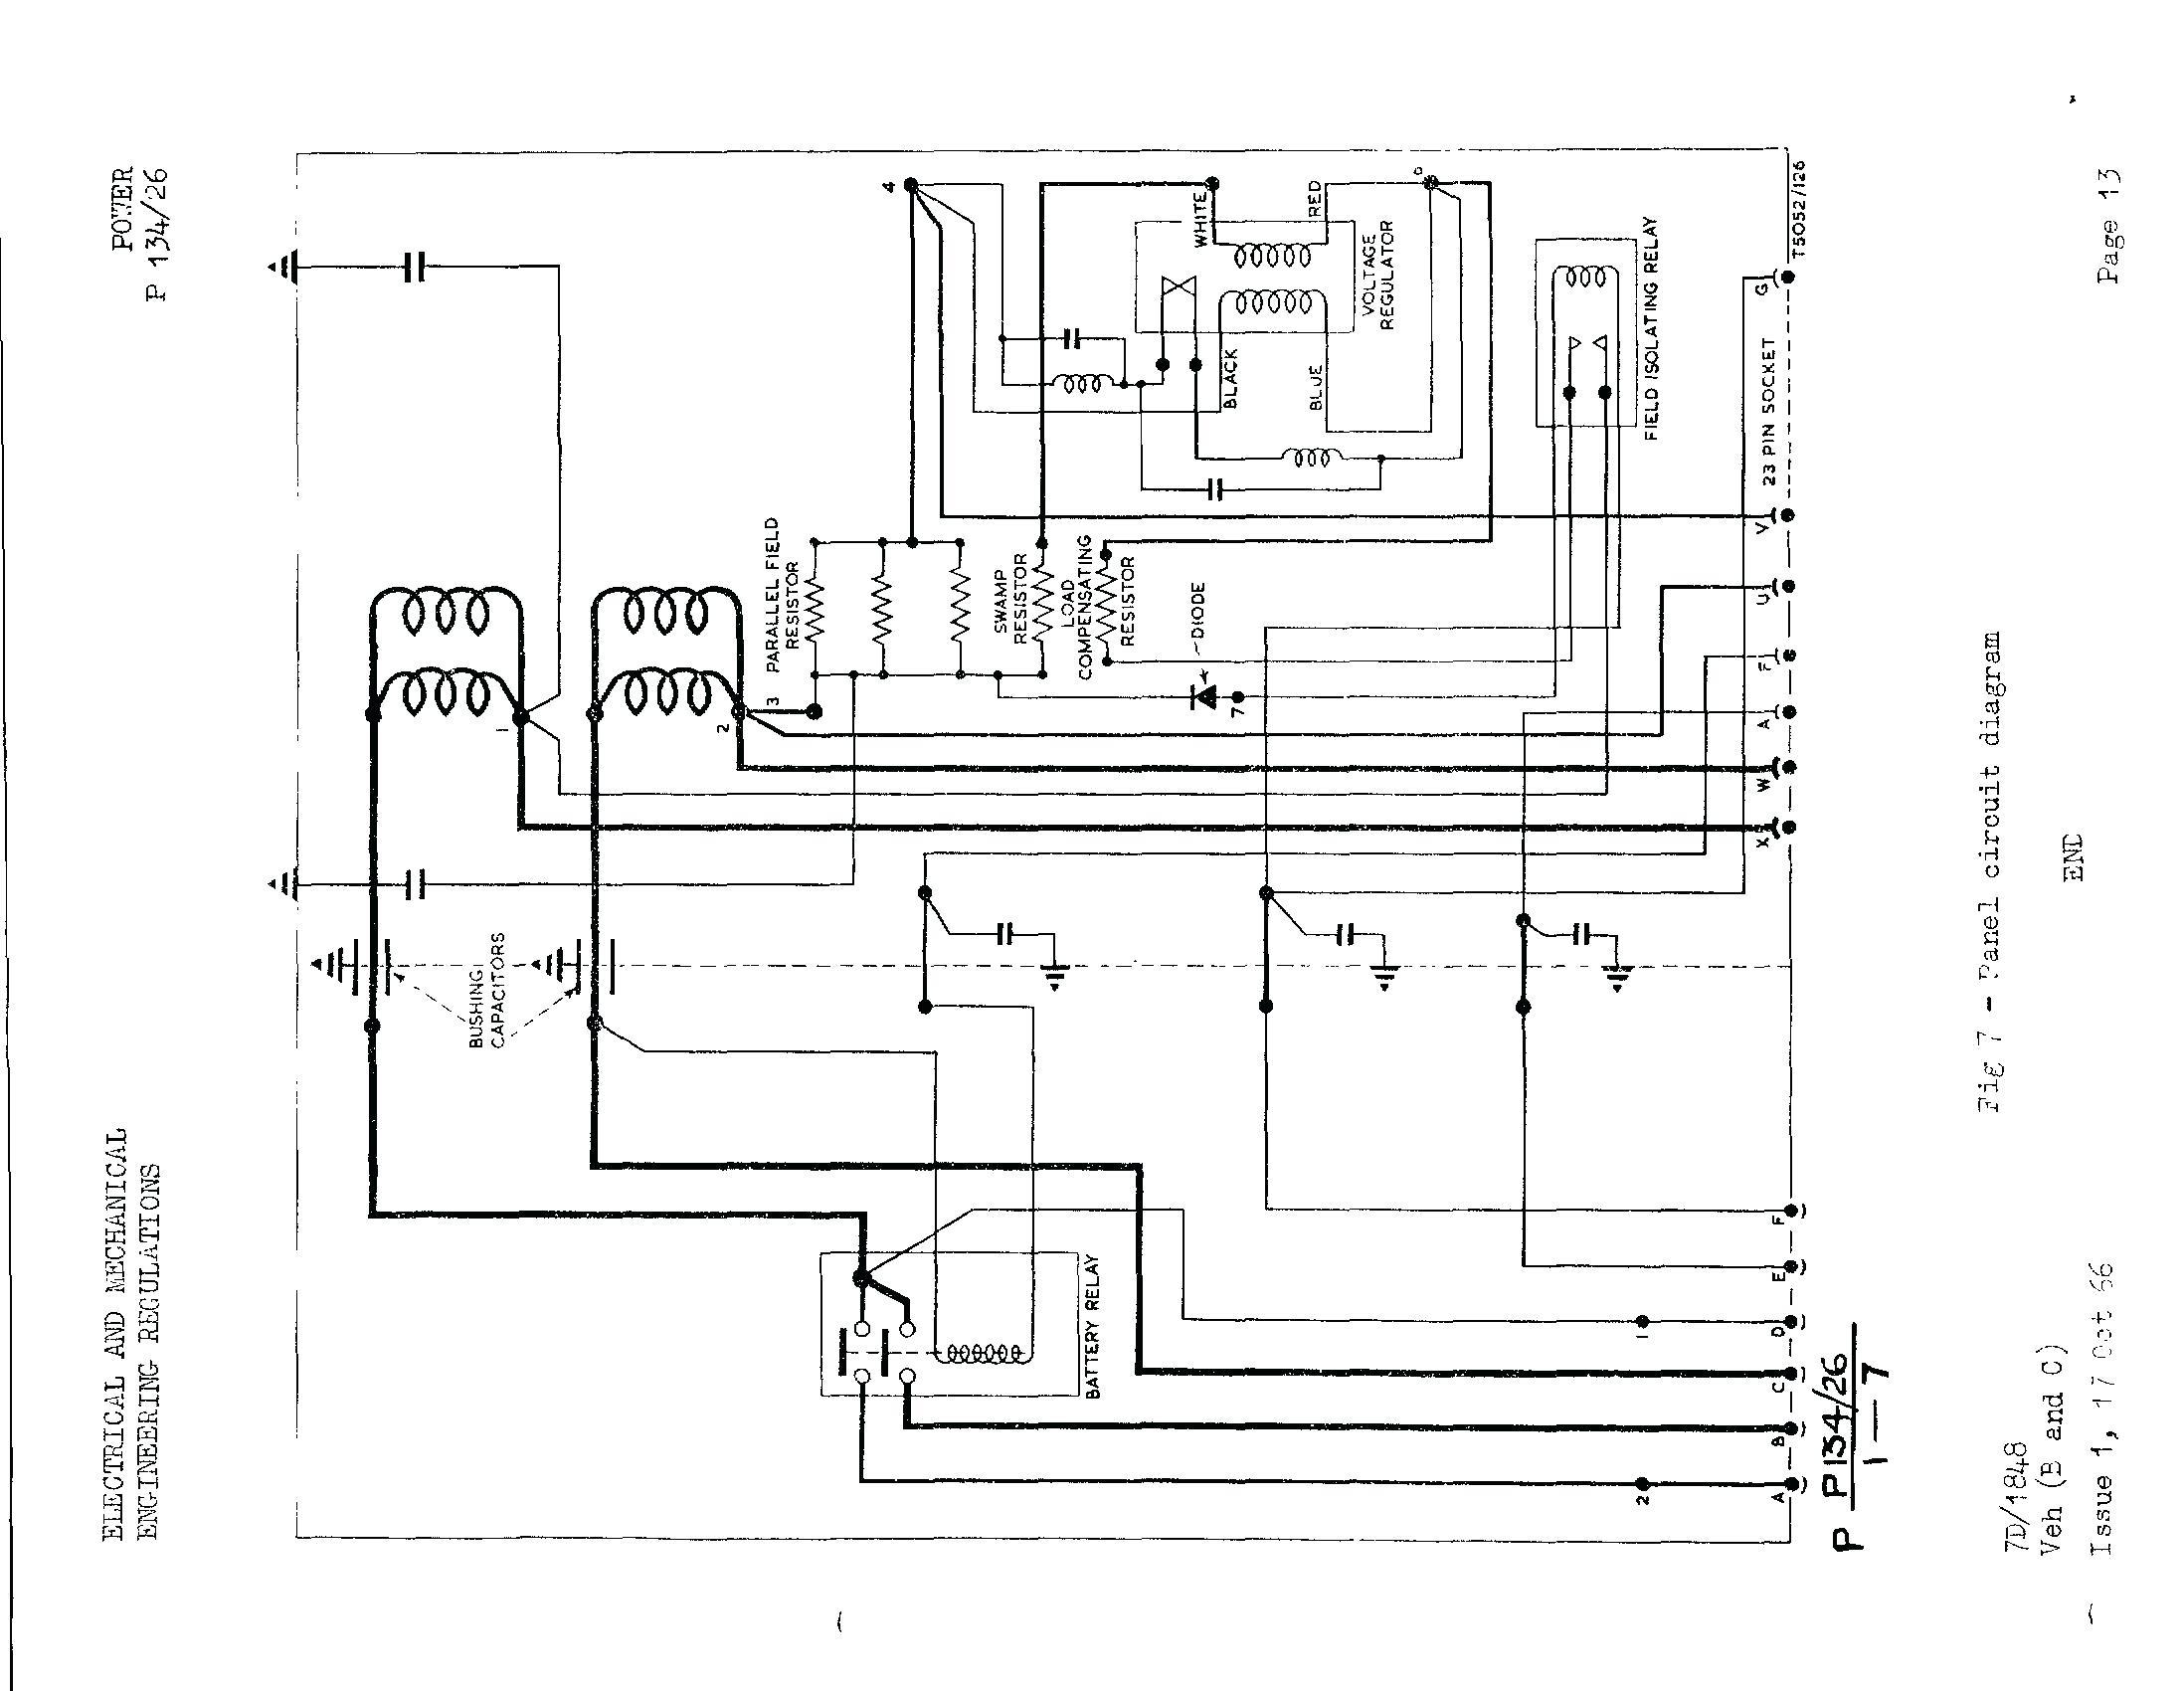 Club Car Starter Wiring Diagram | Wiring Library - Club Car Starter Generator Wiring Diagram